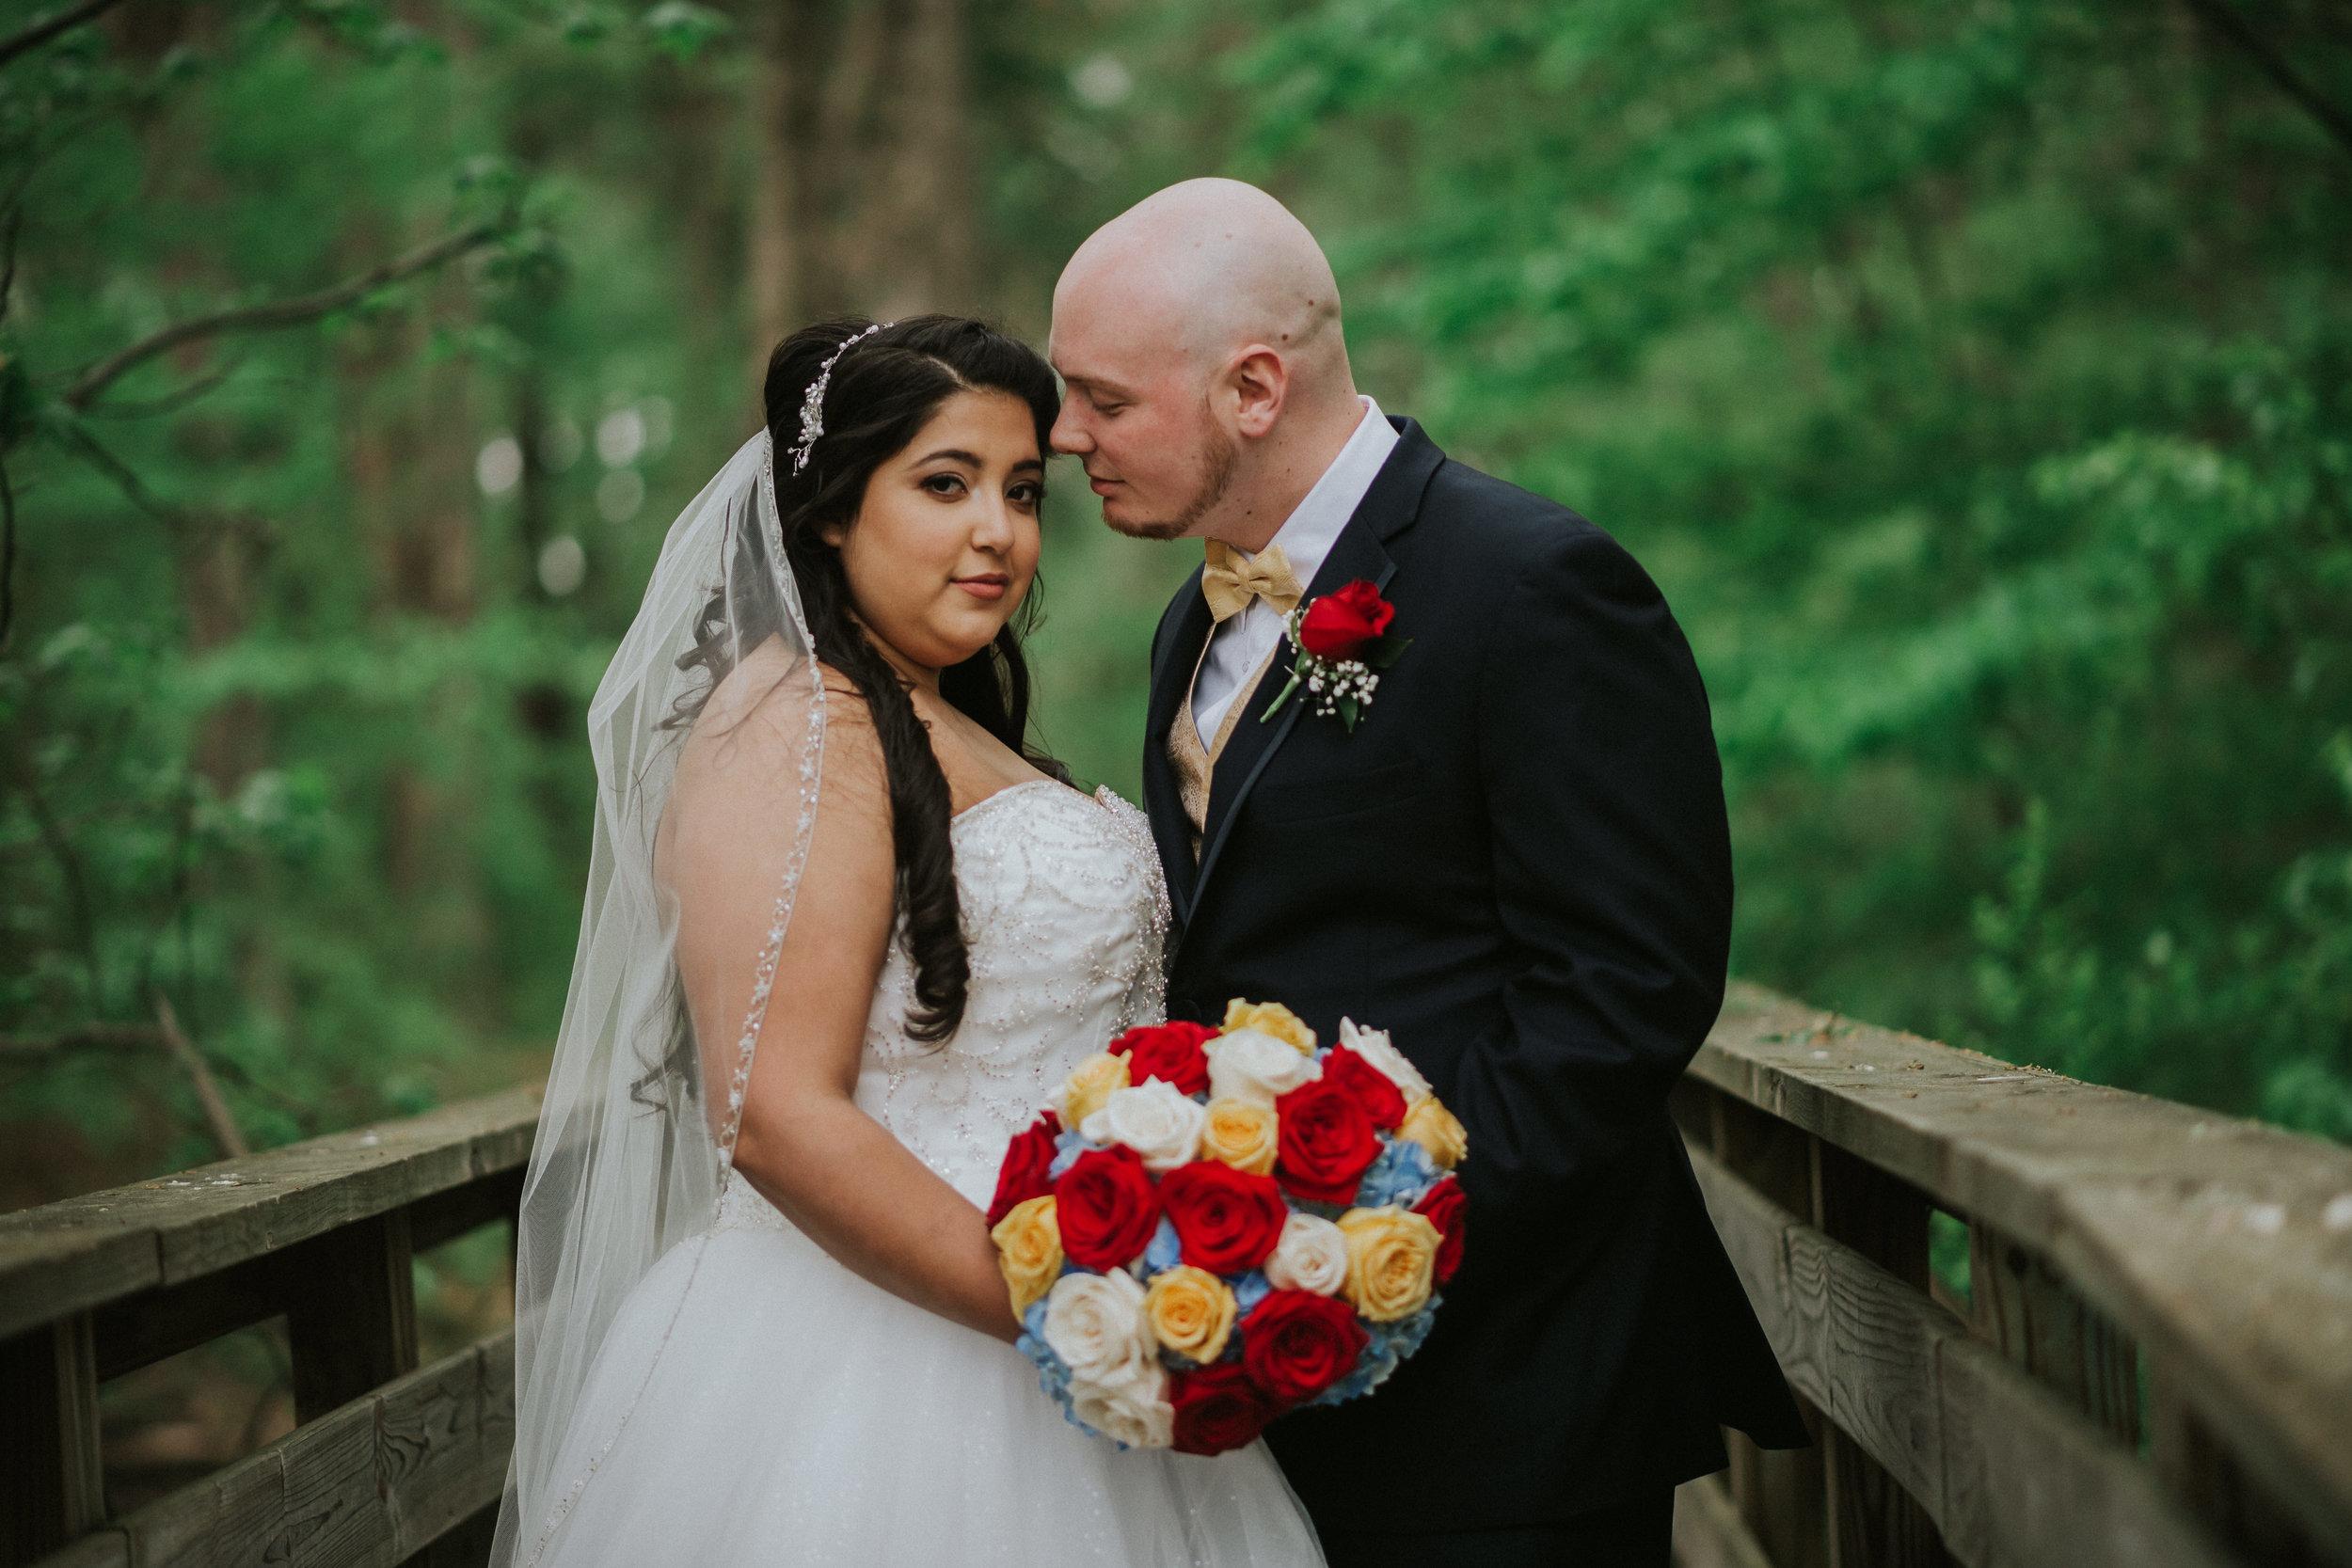 Barclay-Farmstead-Wedding-Rosa-and-Mike-407.jpg